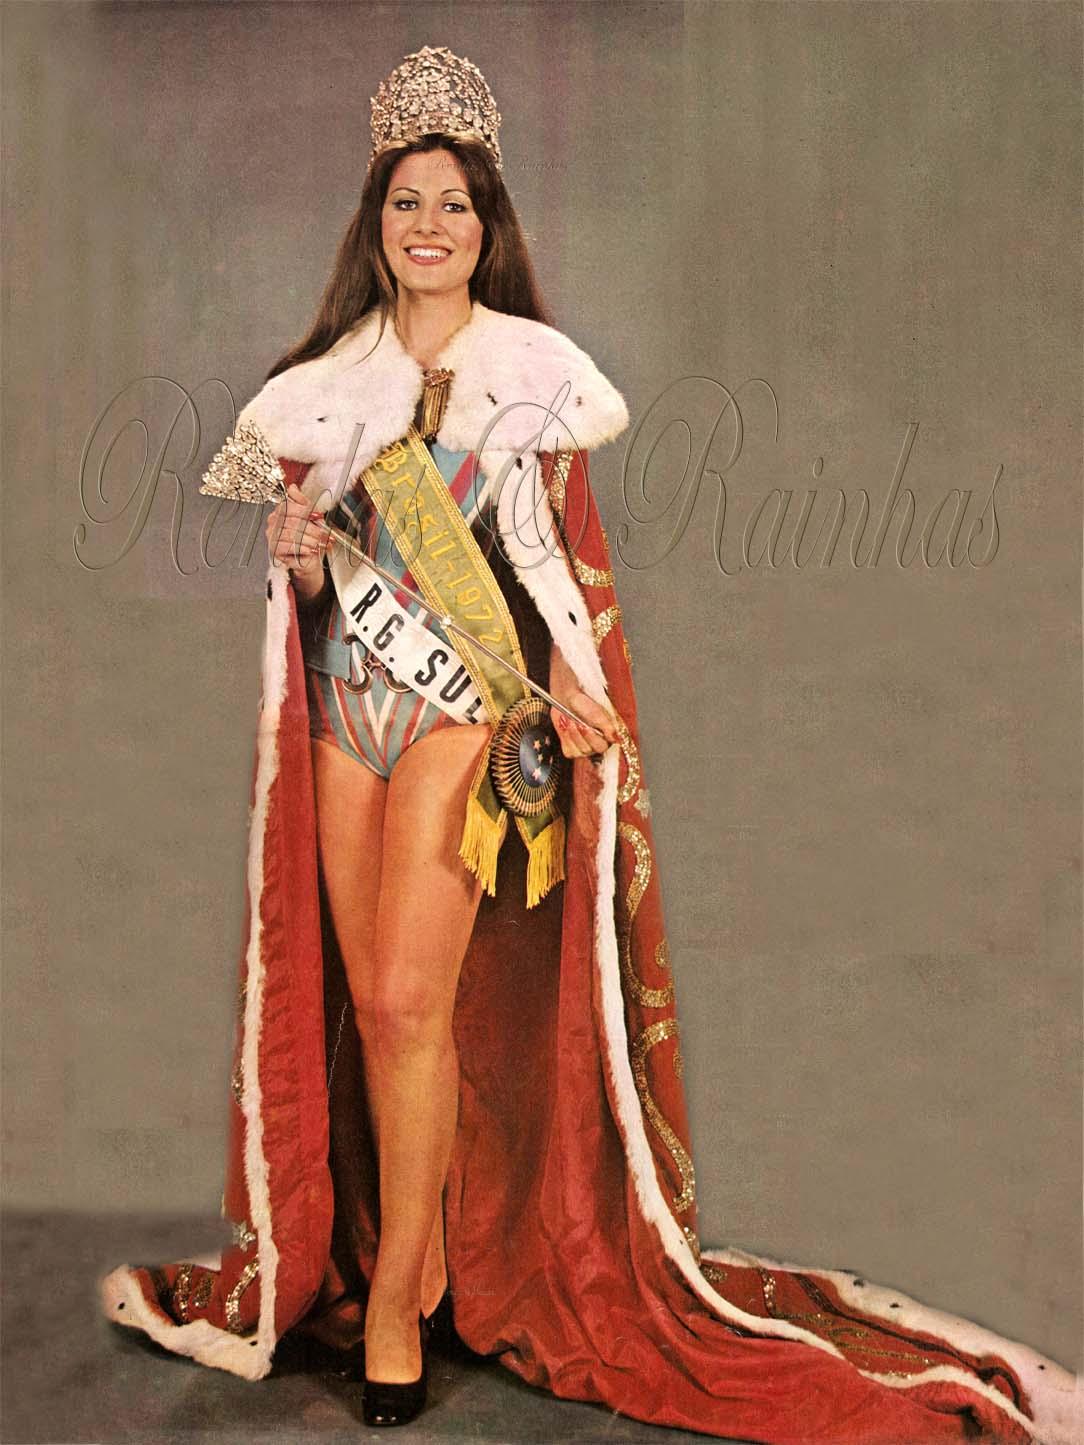 rejane goulart (rejane vieira), top 2 de miss universe 1972 (11/15/1954 - 12/26/2013). † Majest10